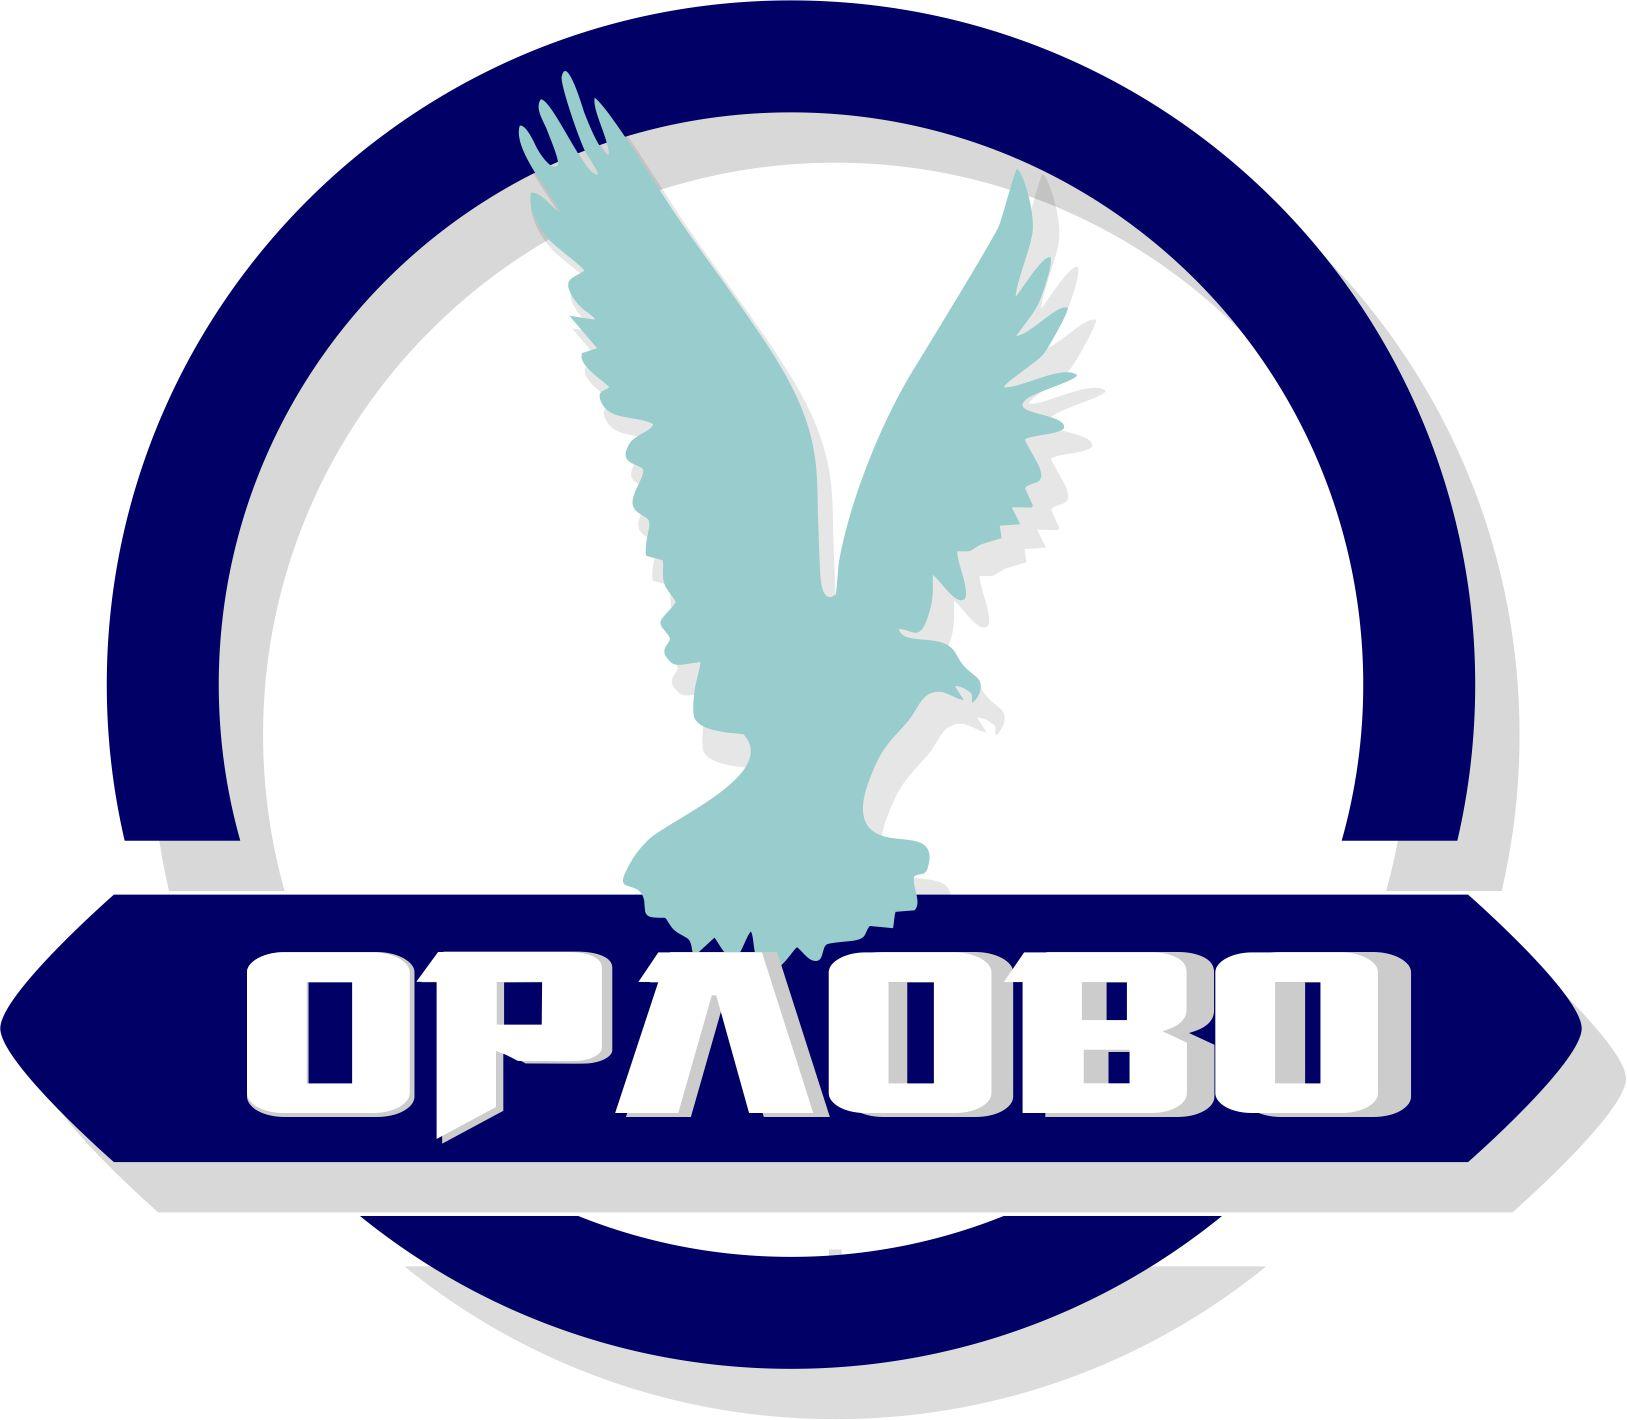 Разработка логотипа для Торгово-развлекательного комплекса фото f_8155969b12f8bfcc.jpg